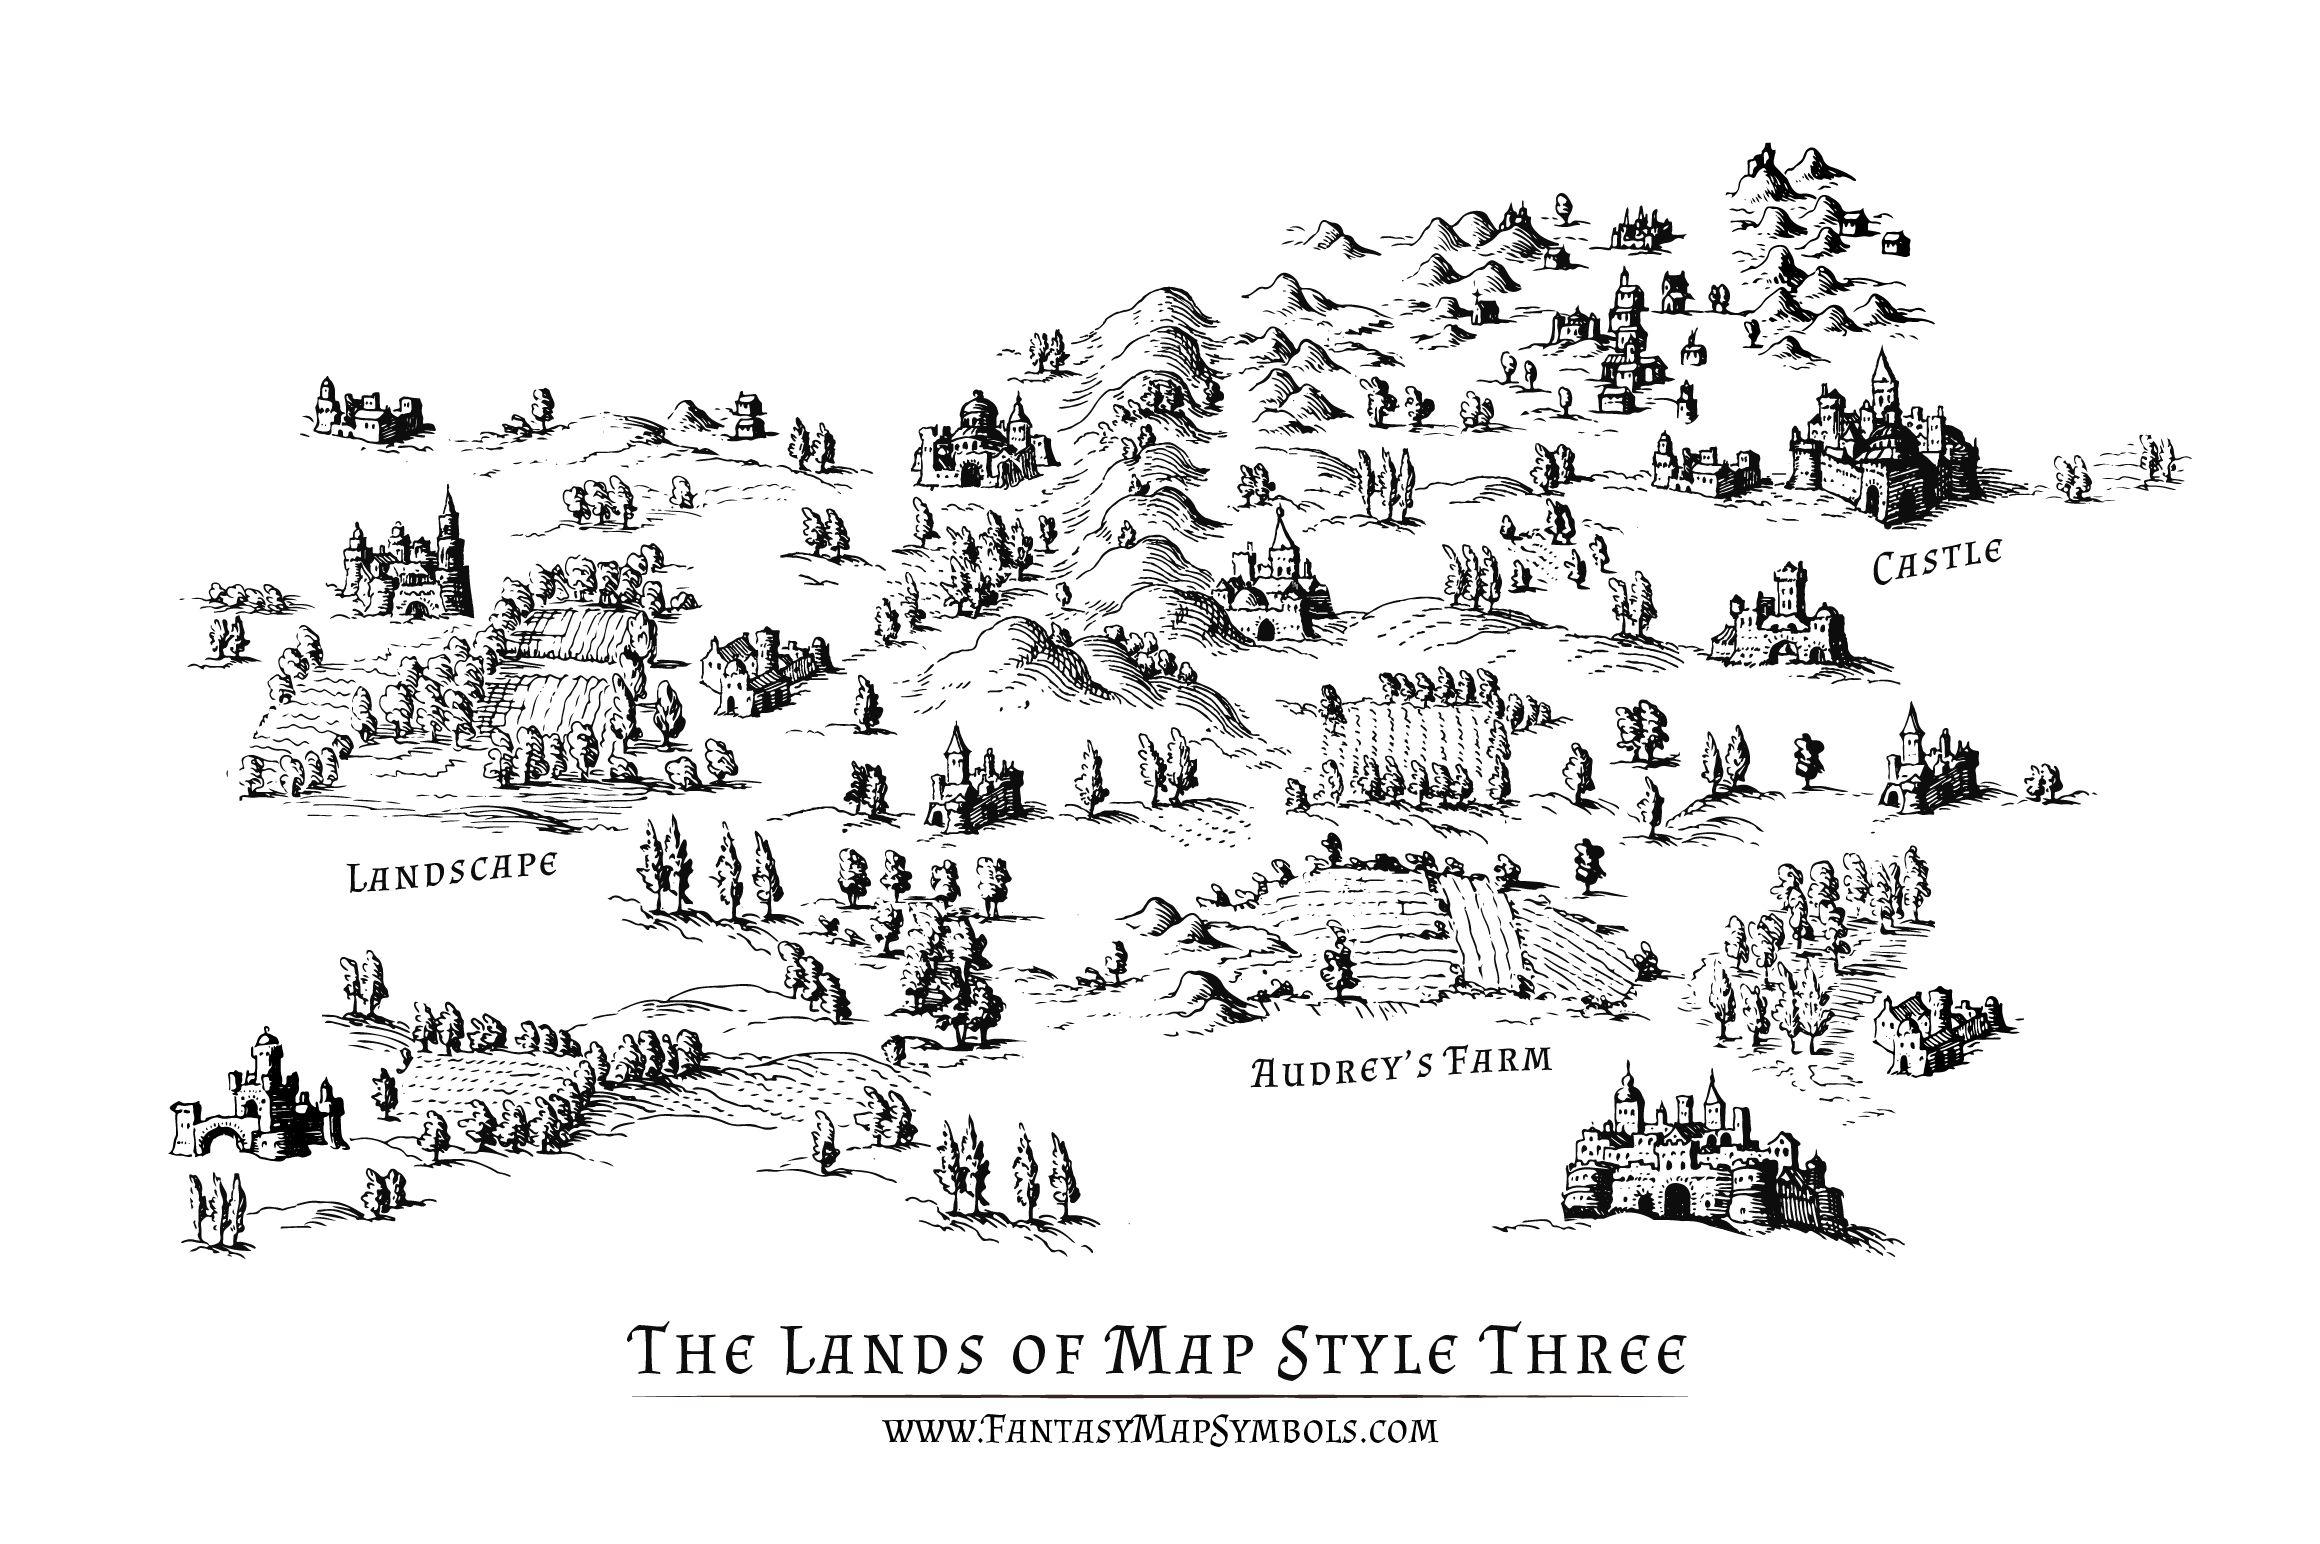 Fantasy Map Symbol Set 3 Illustrator Png Fantasy Map Symbols Fantasy Map Map Symbols Map